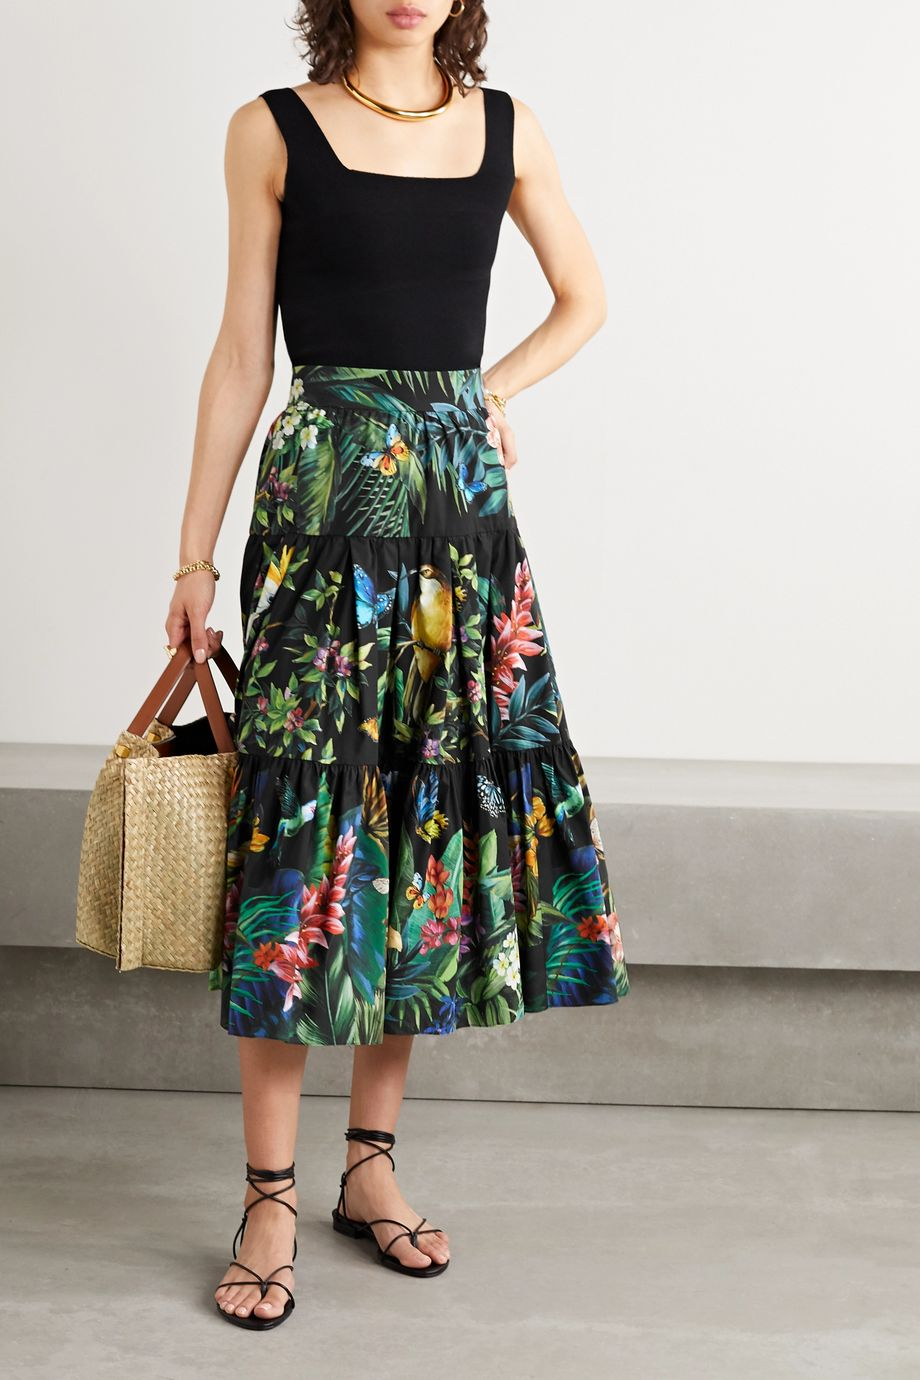 Dolce & Gabbana Gestufter Midirock aus bedruckter Baumwollpopeline